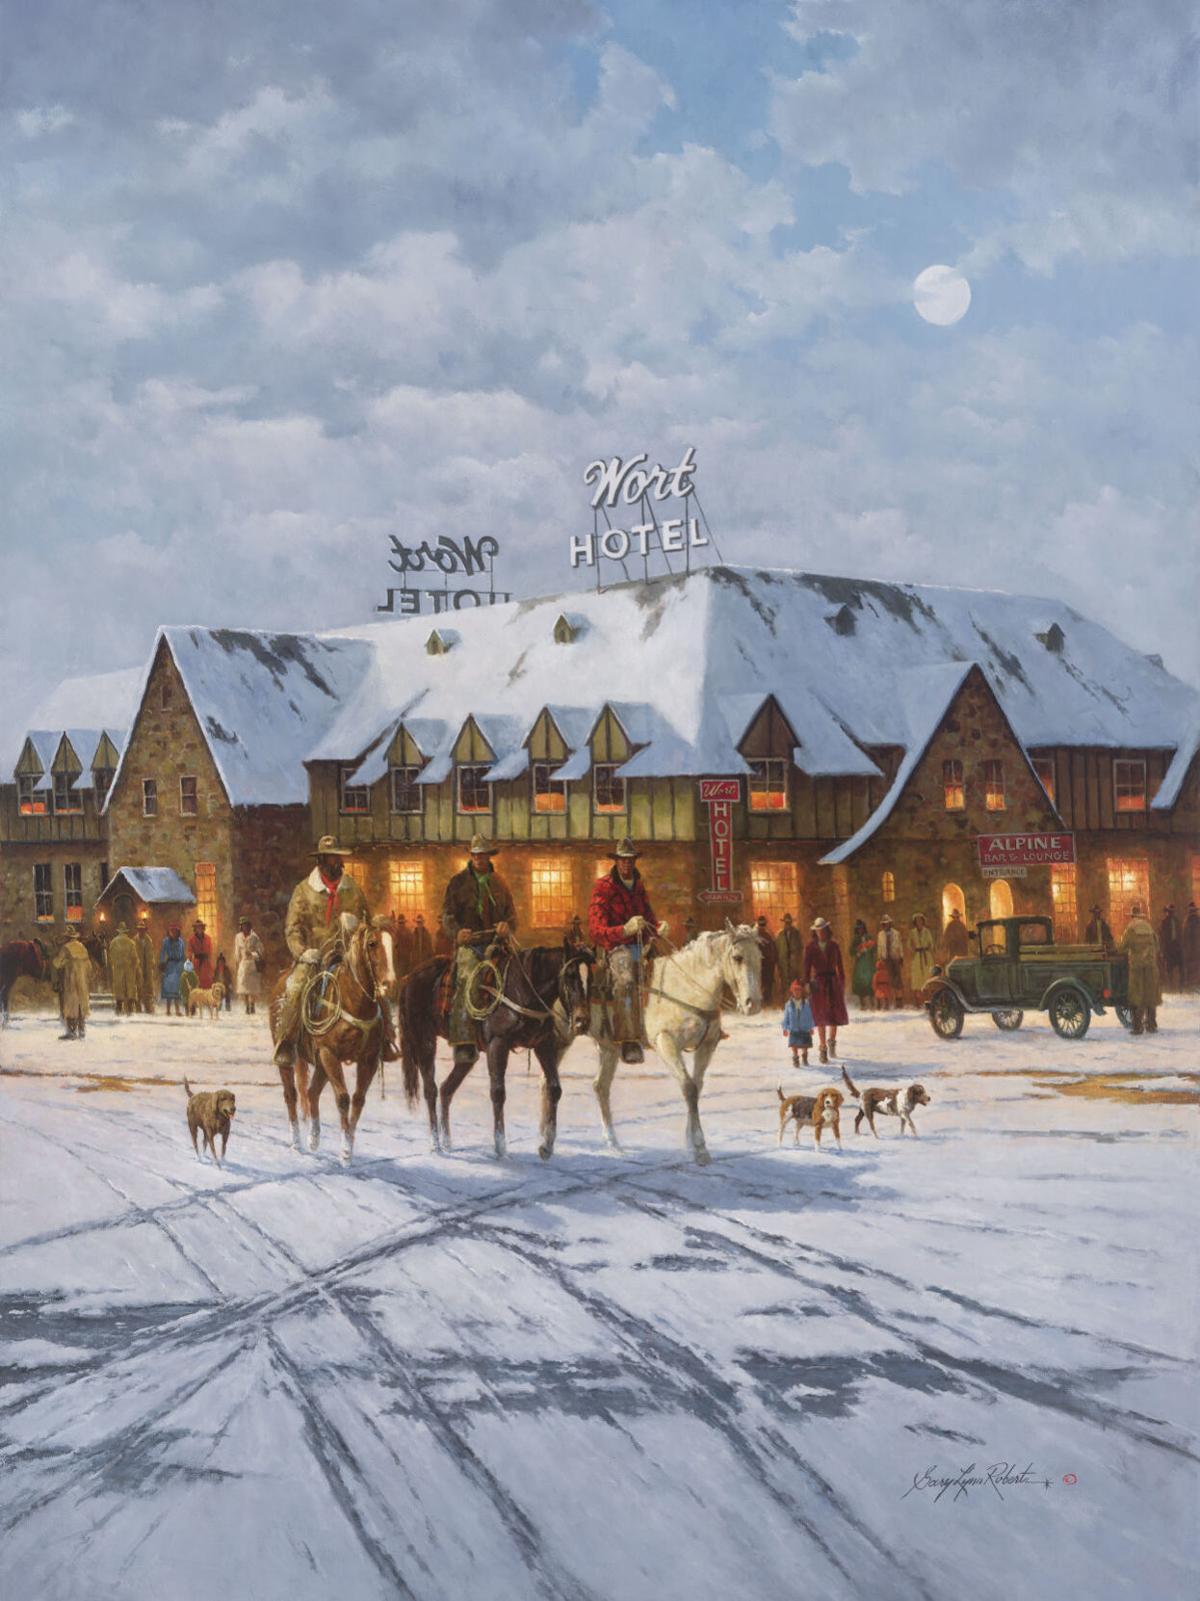 The Wort Hotel by Gary Lynn Roberts